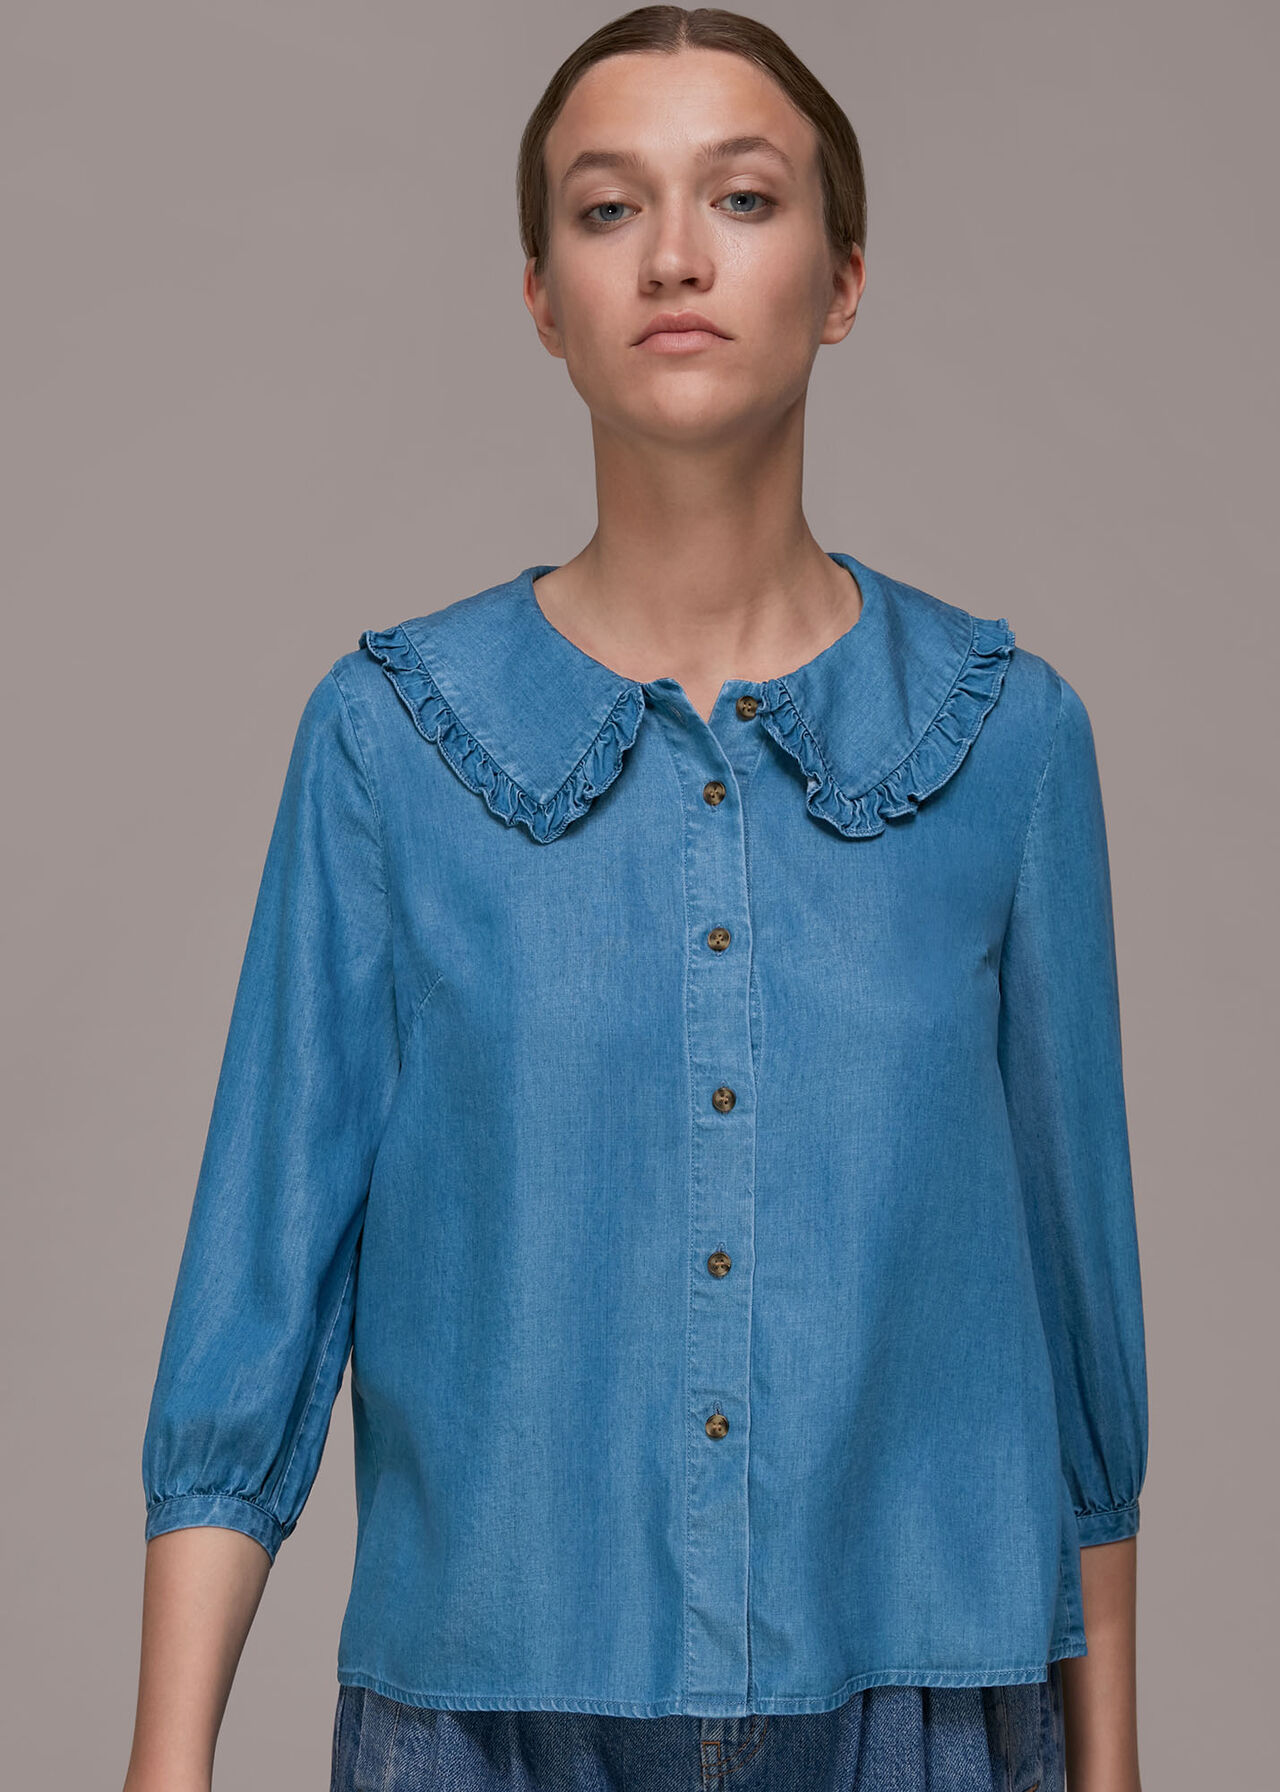 Collar Detail Denim Shirt